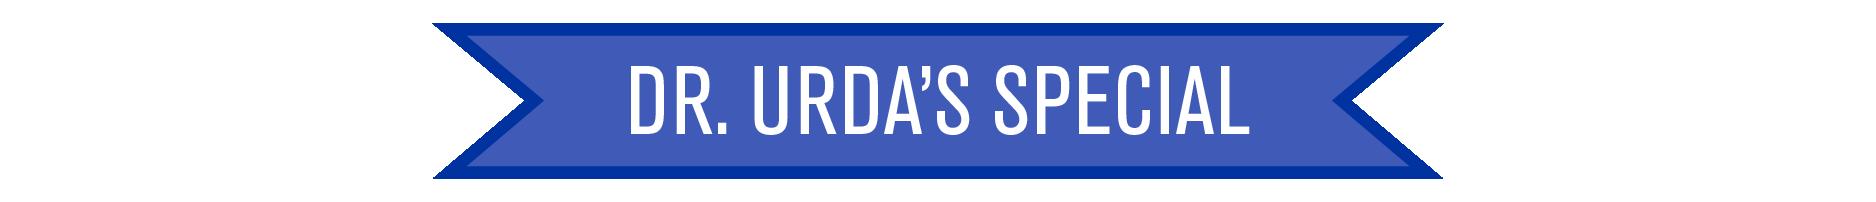 Dr. Urda's Special